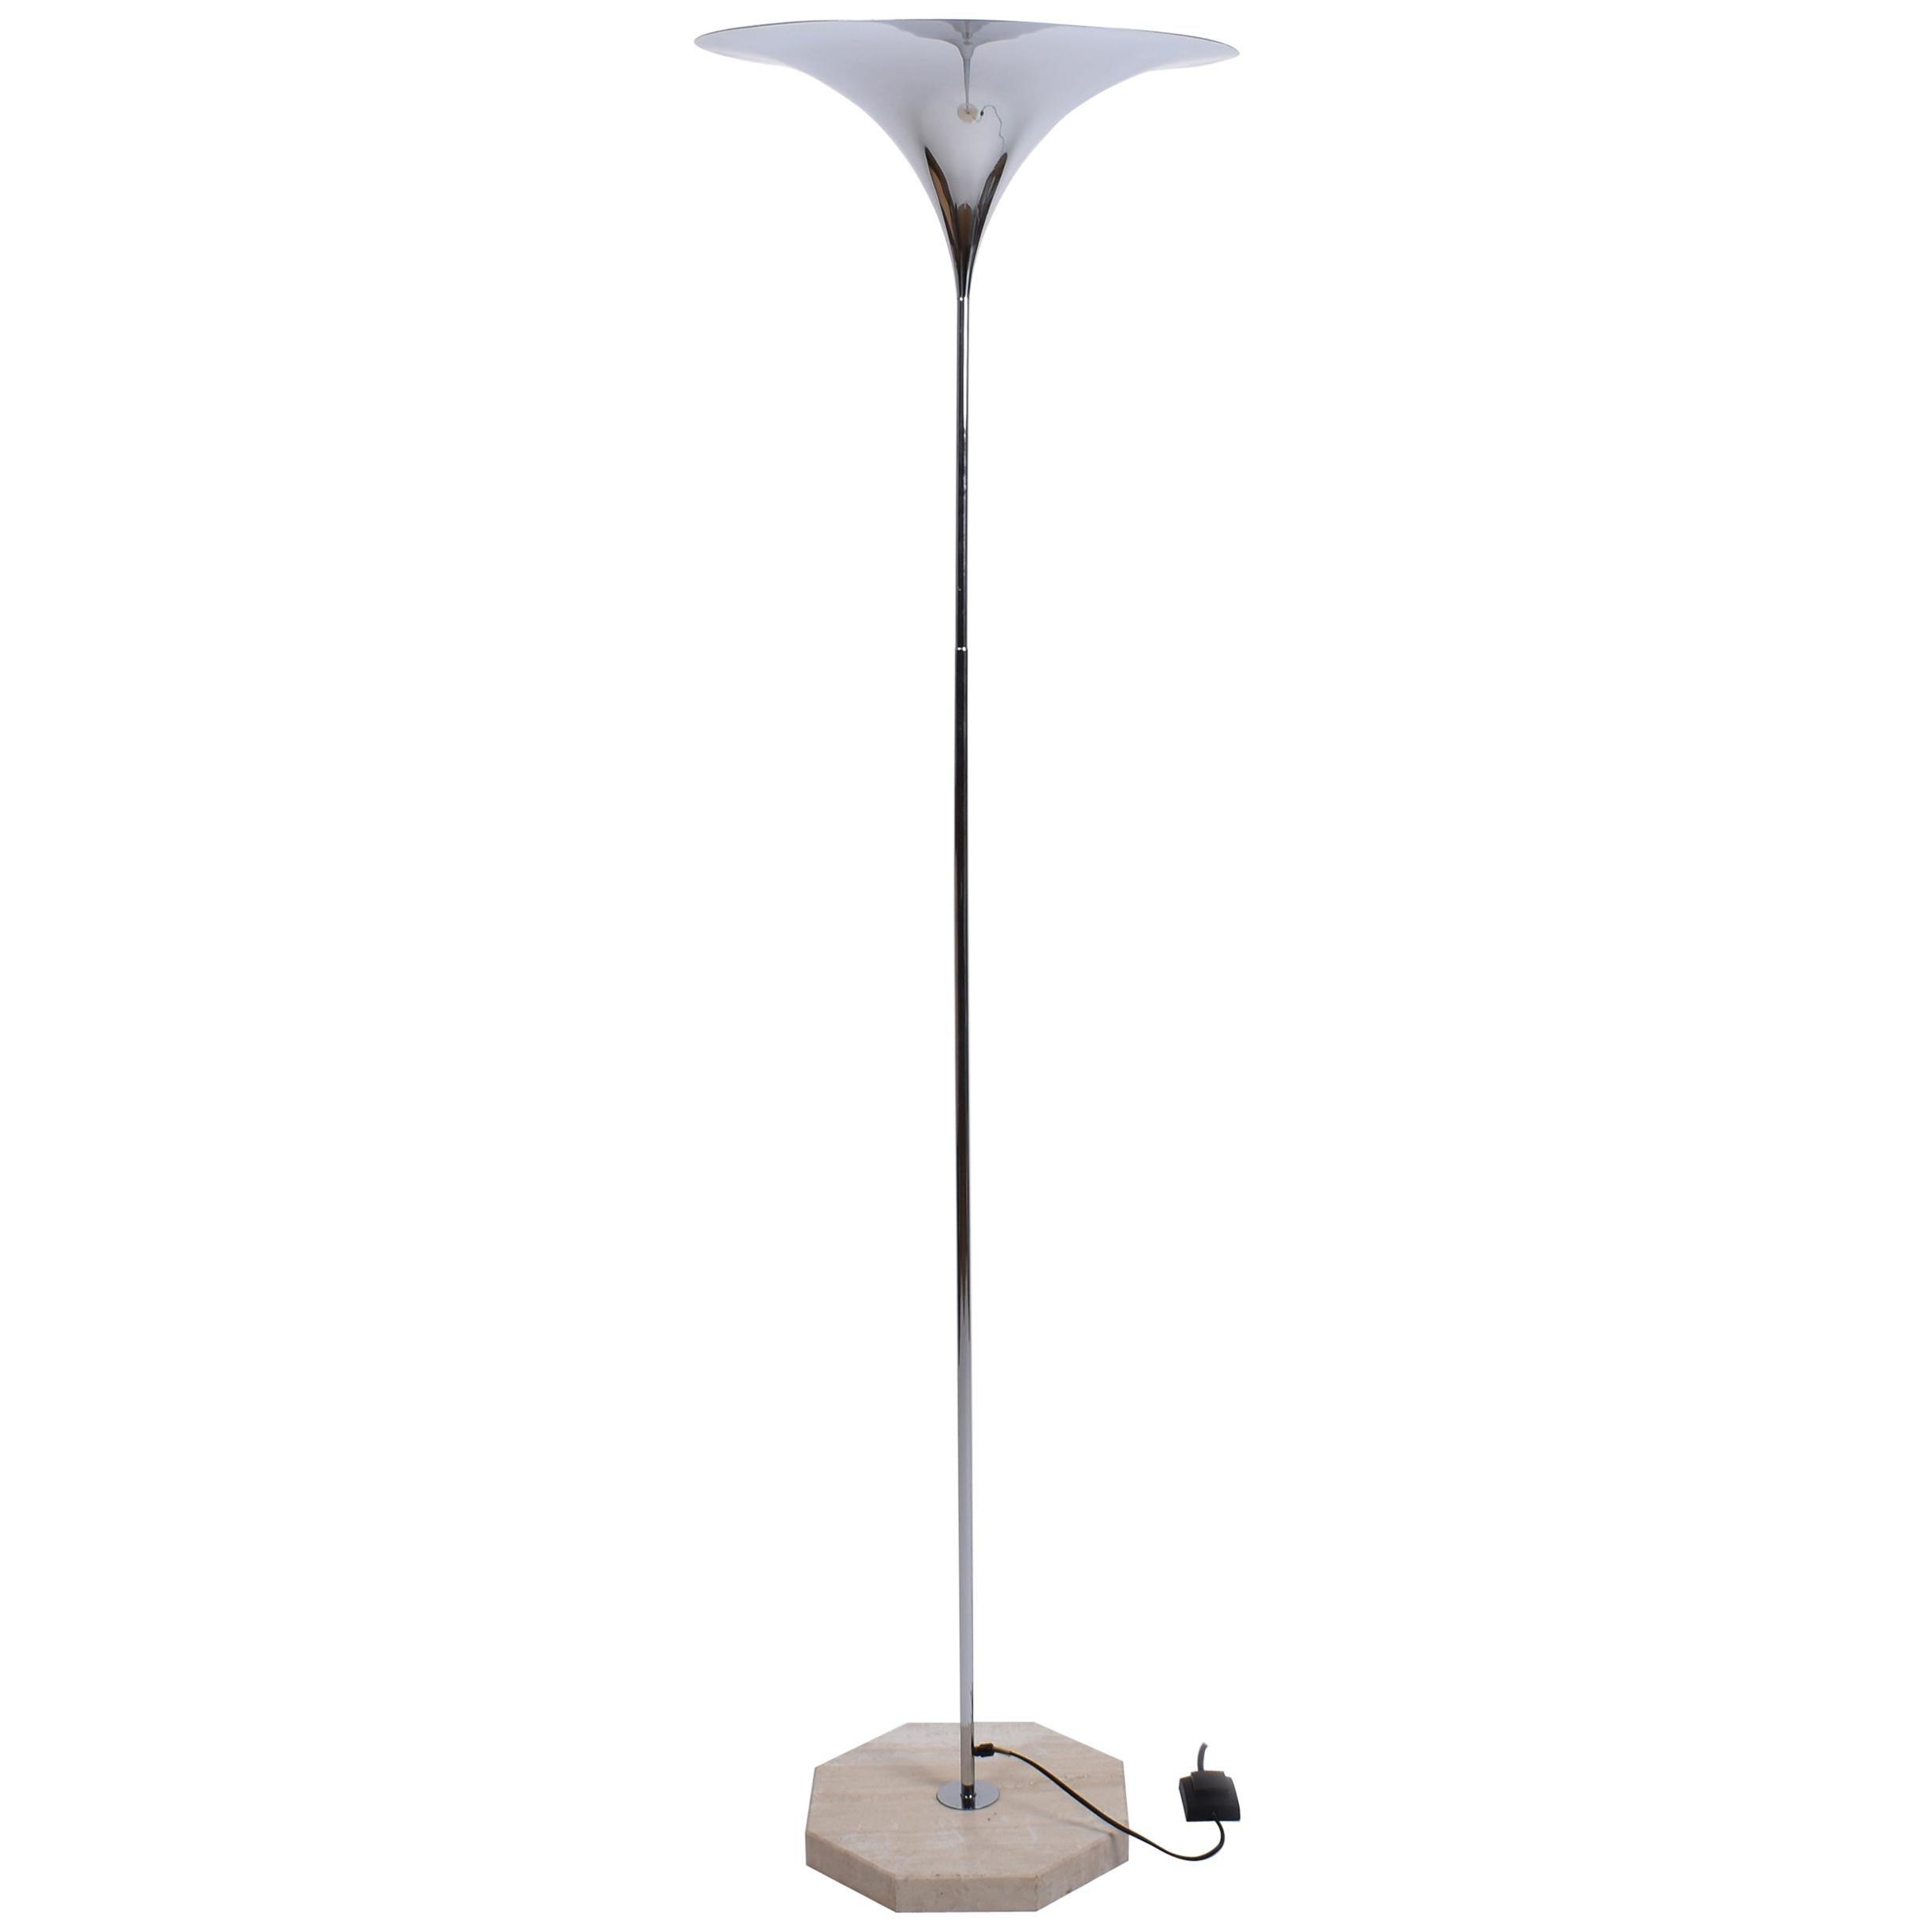 Mid-Century Modern Semi Floor Lamp with Travertine Base, Italy, 1970